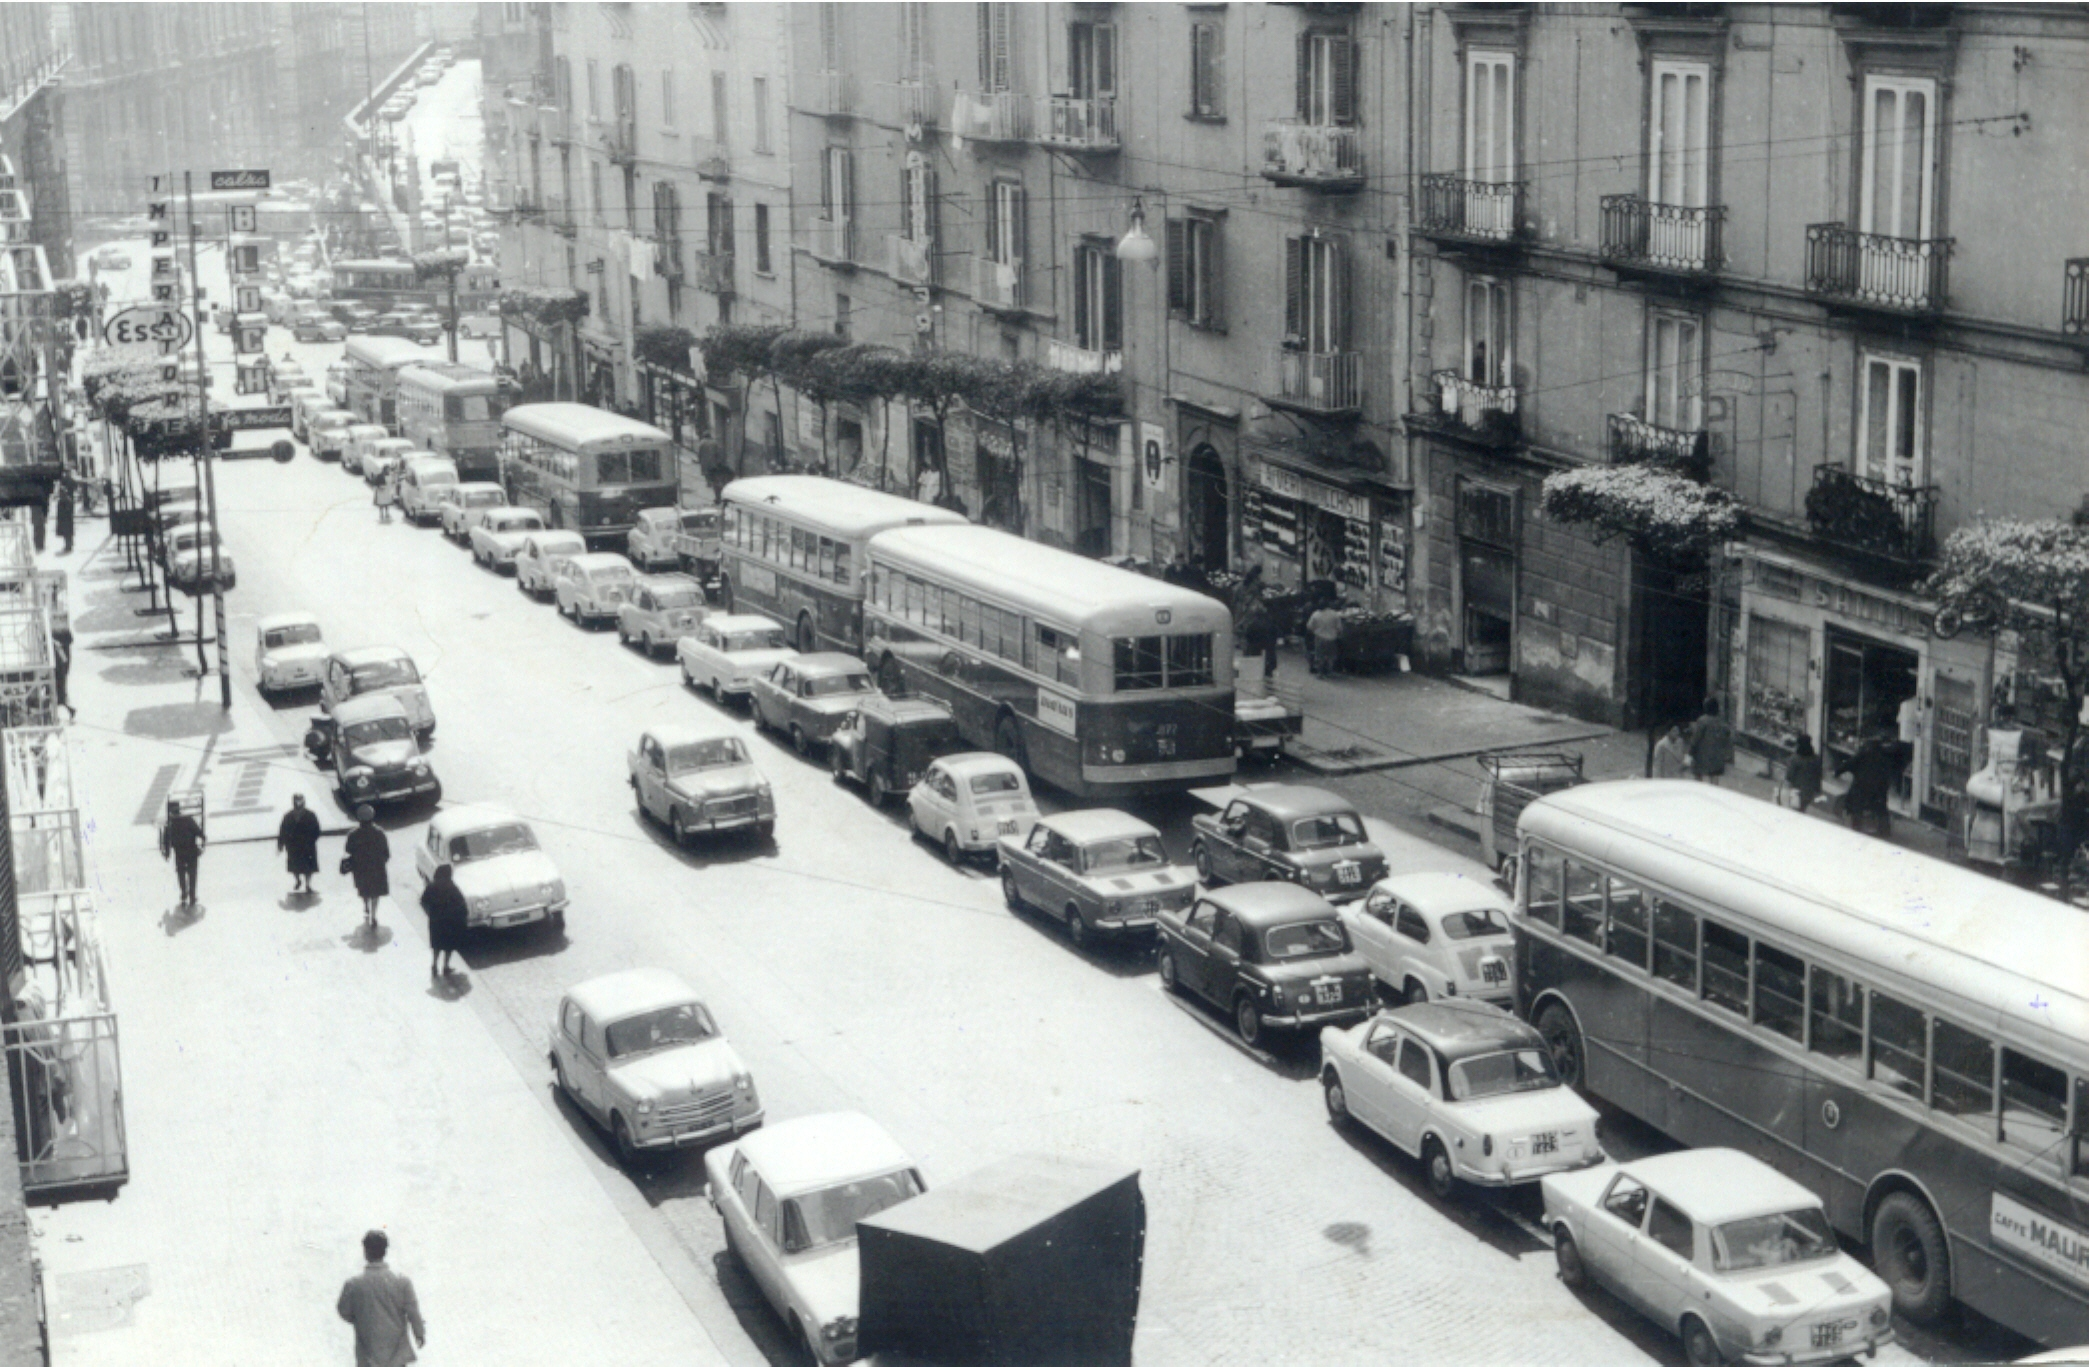 Napoli, Via S. Teresa